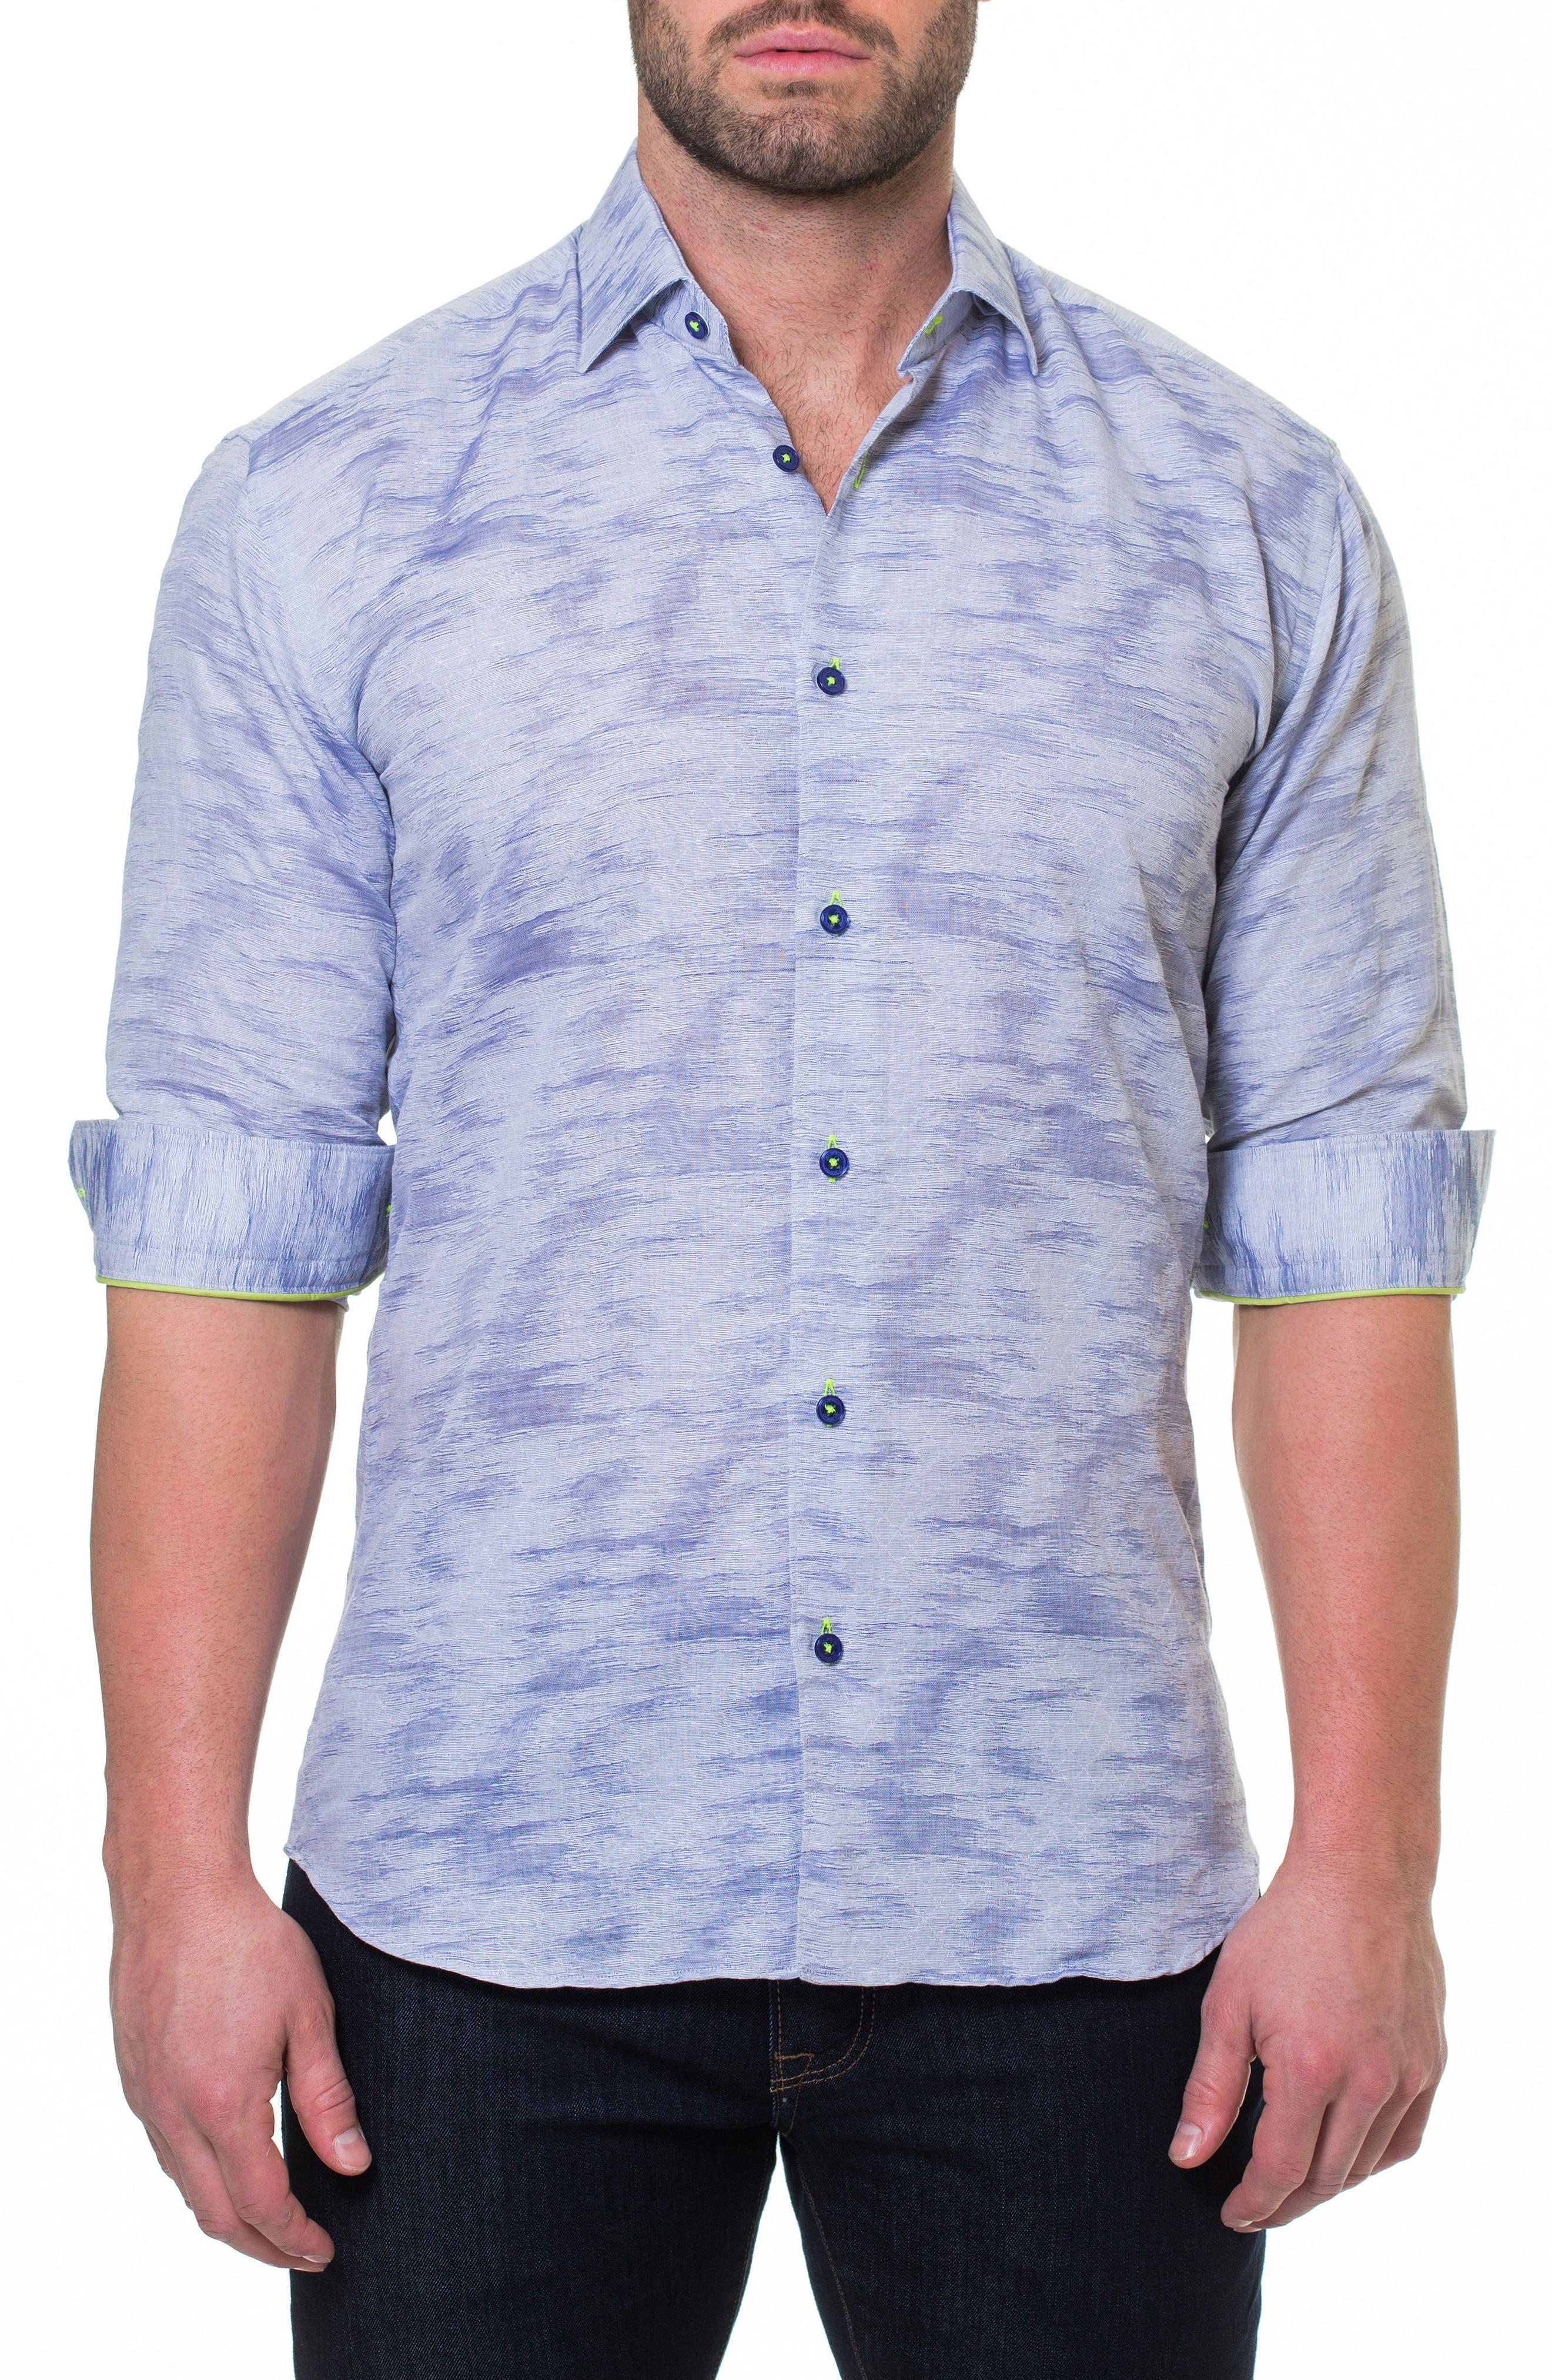 Luxor Richter Slim Fit Sport Shirt,                             Main thumbnail 1, color,                             Grey